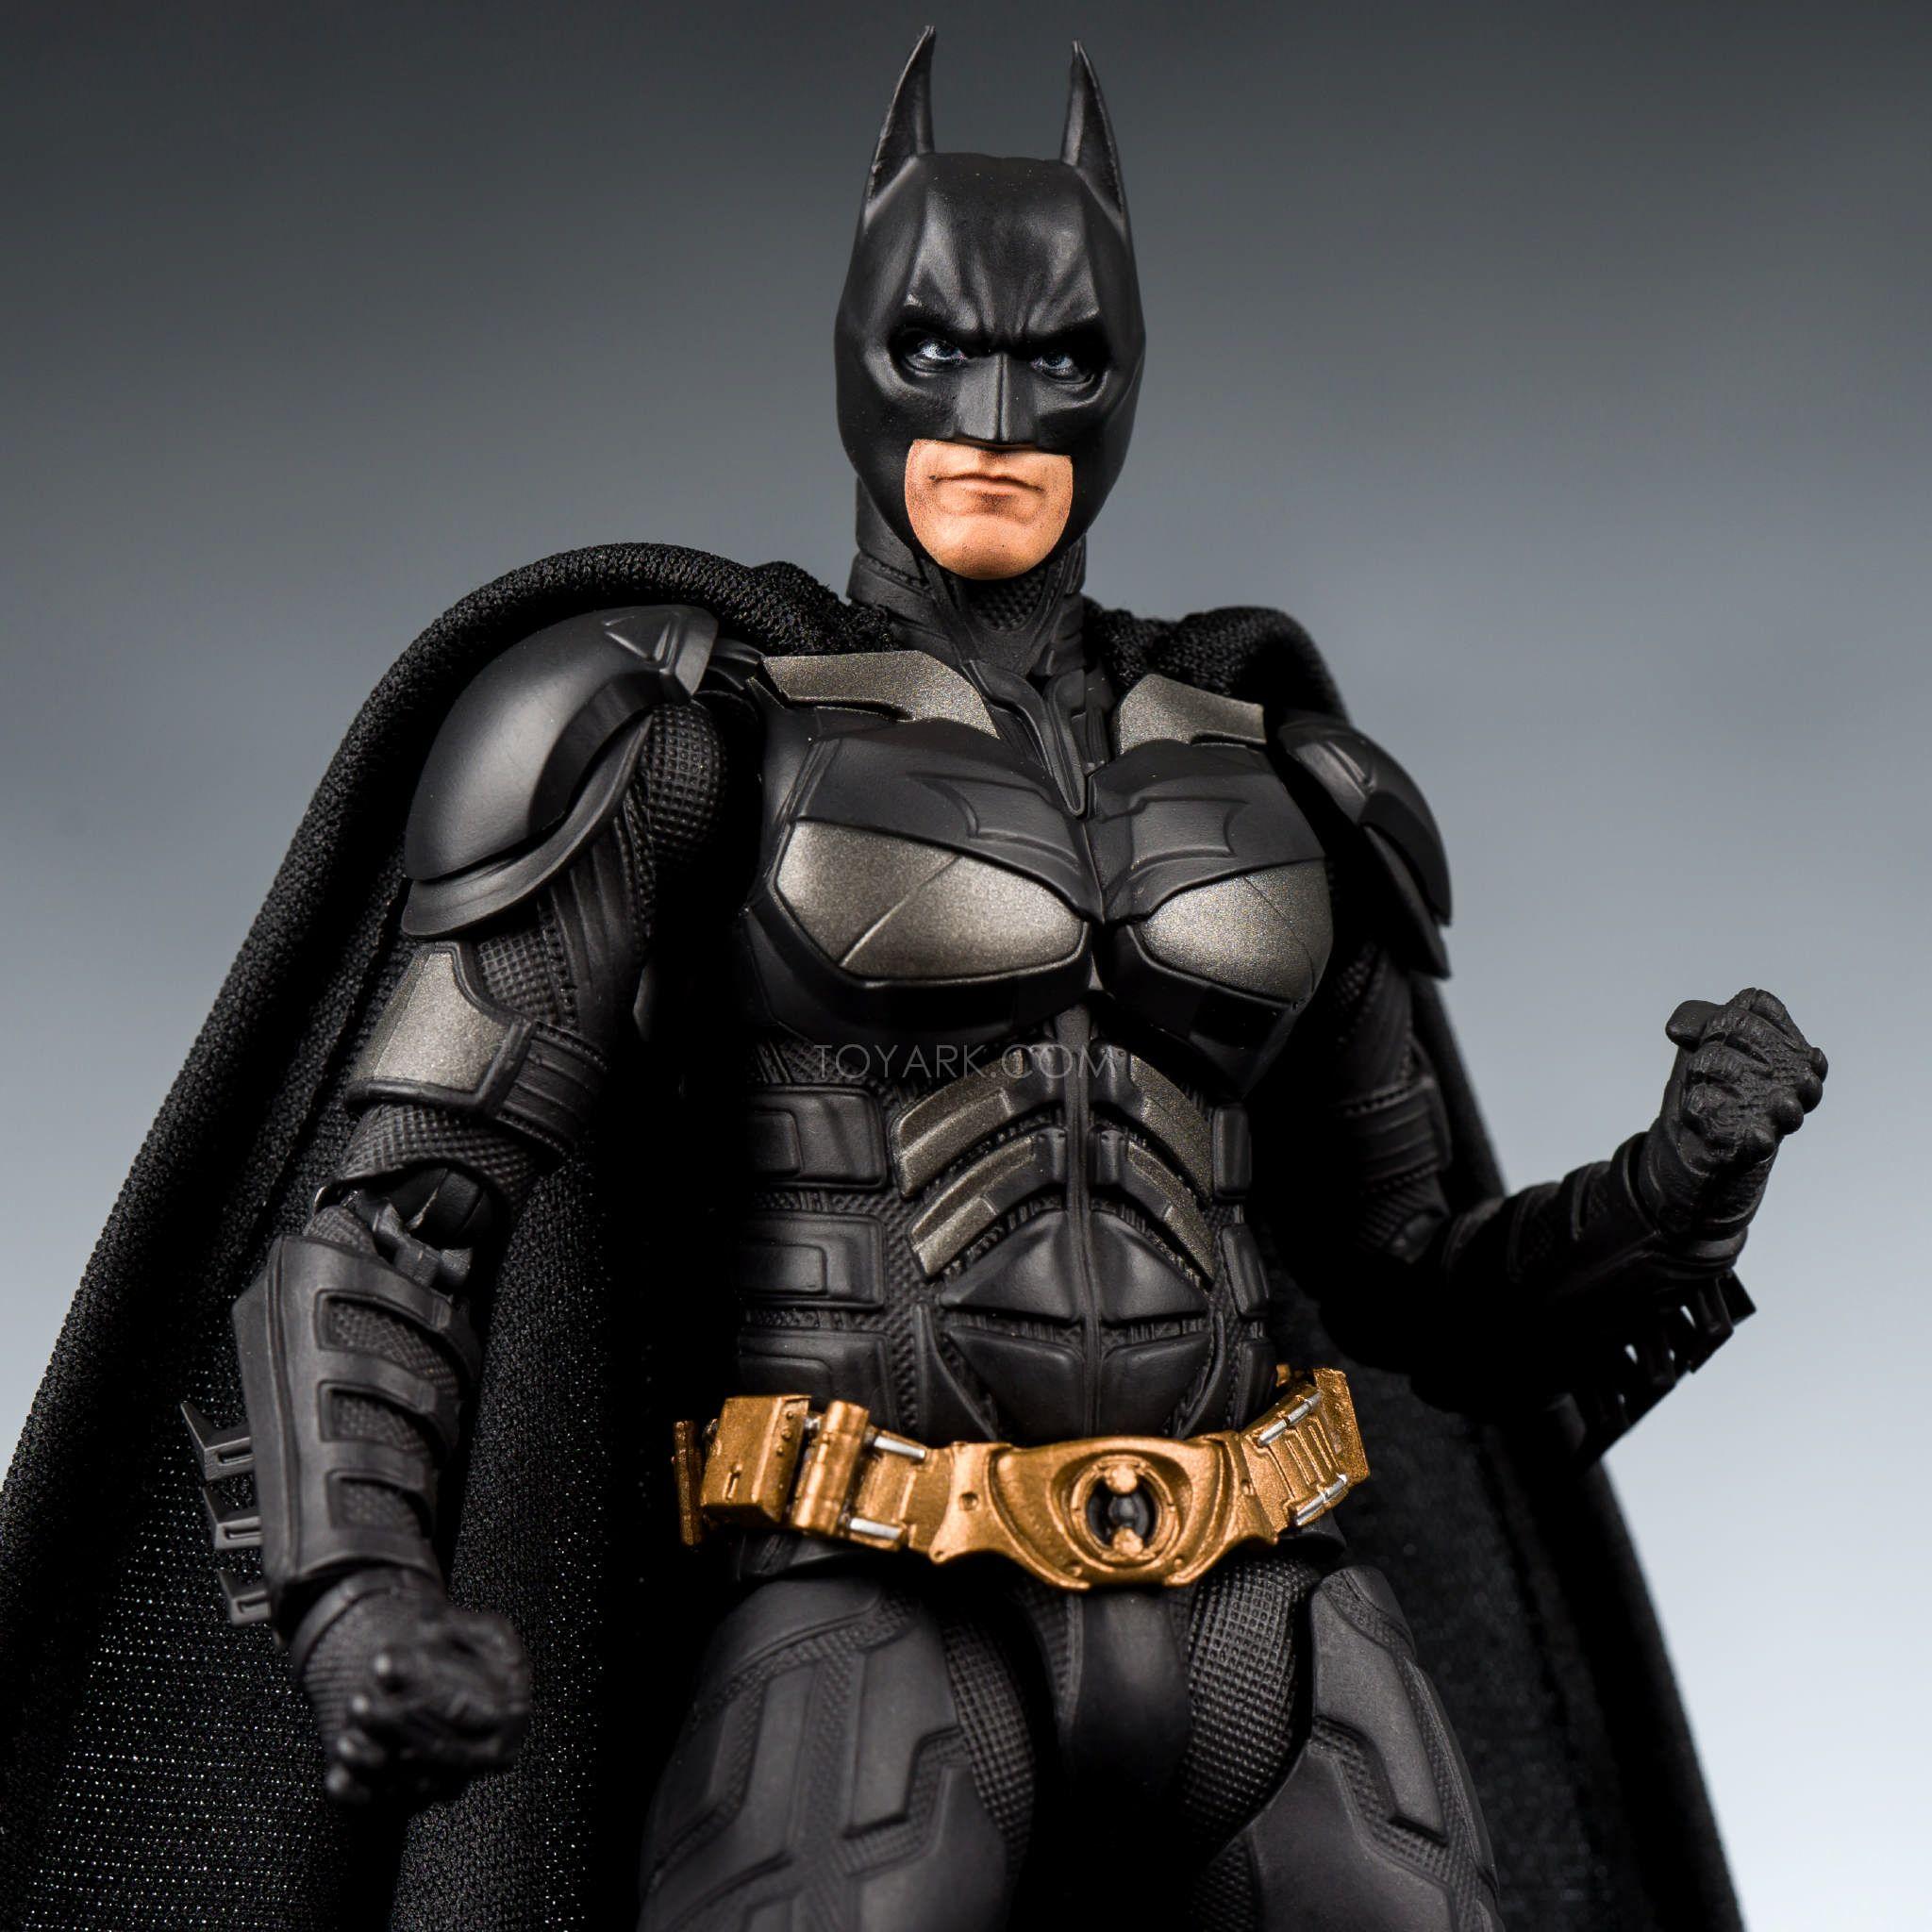 Gamer Home Decor S H Figuarts The Dark Knight Batman Action Figures